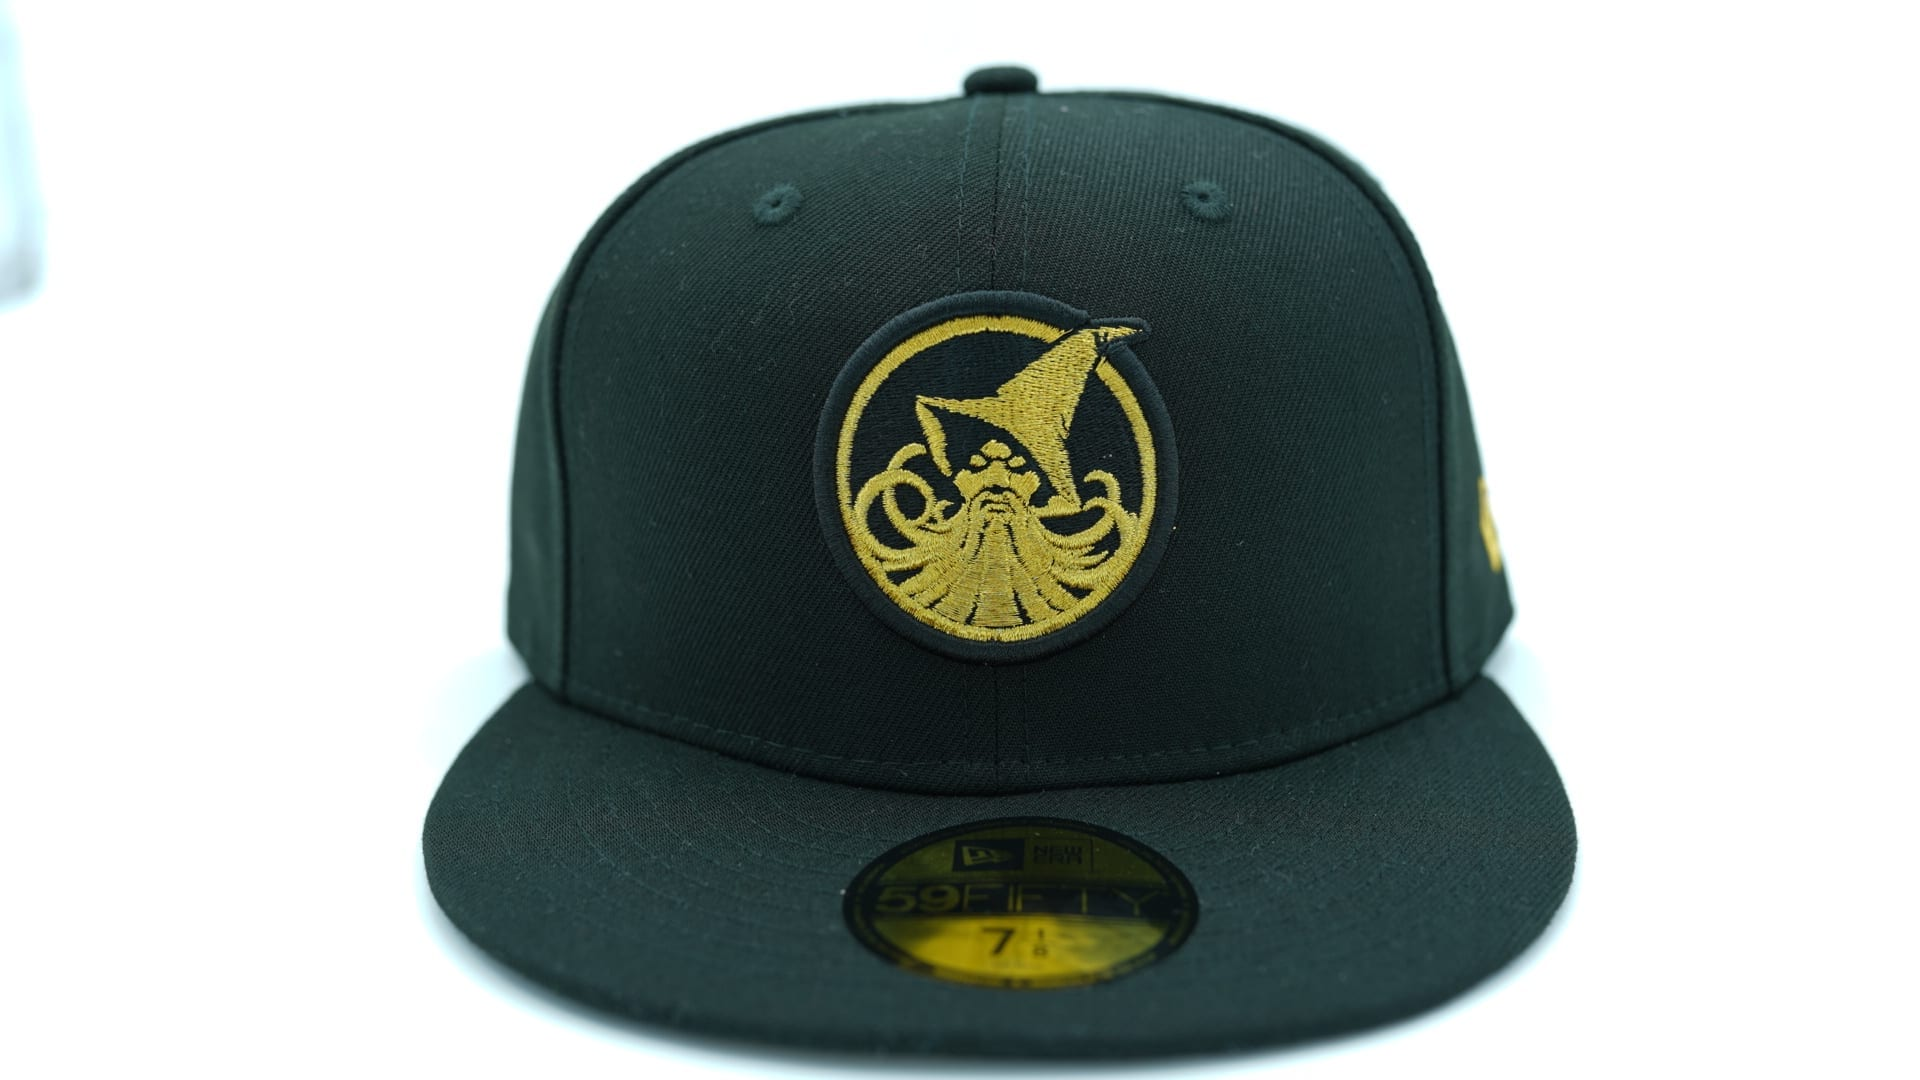 separation shoes 7044d d2138 golden state warriors navy gold 59fifty fitted baseball cap new era nba